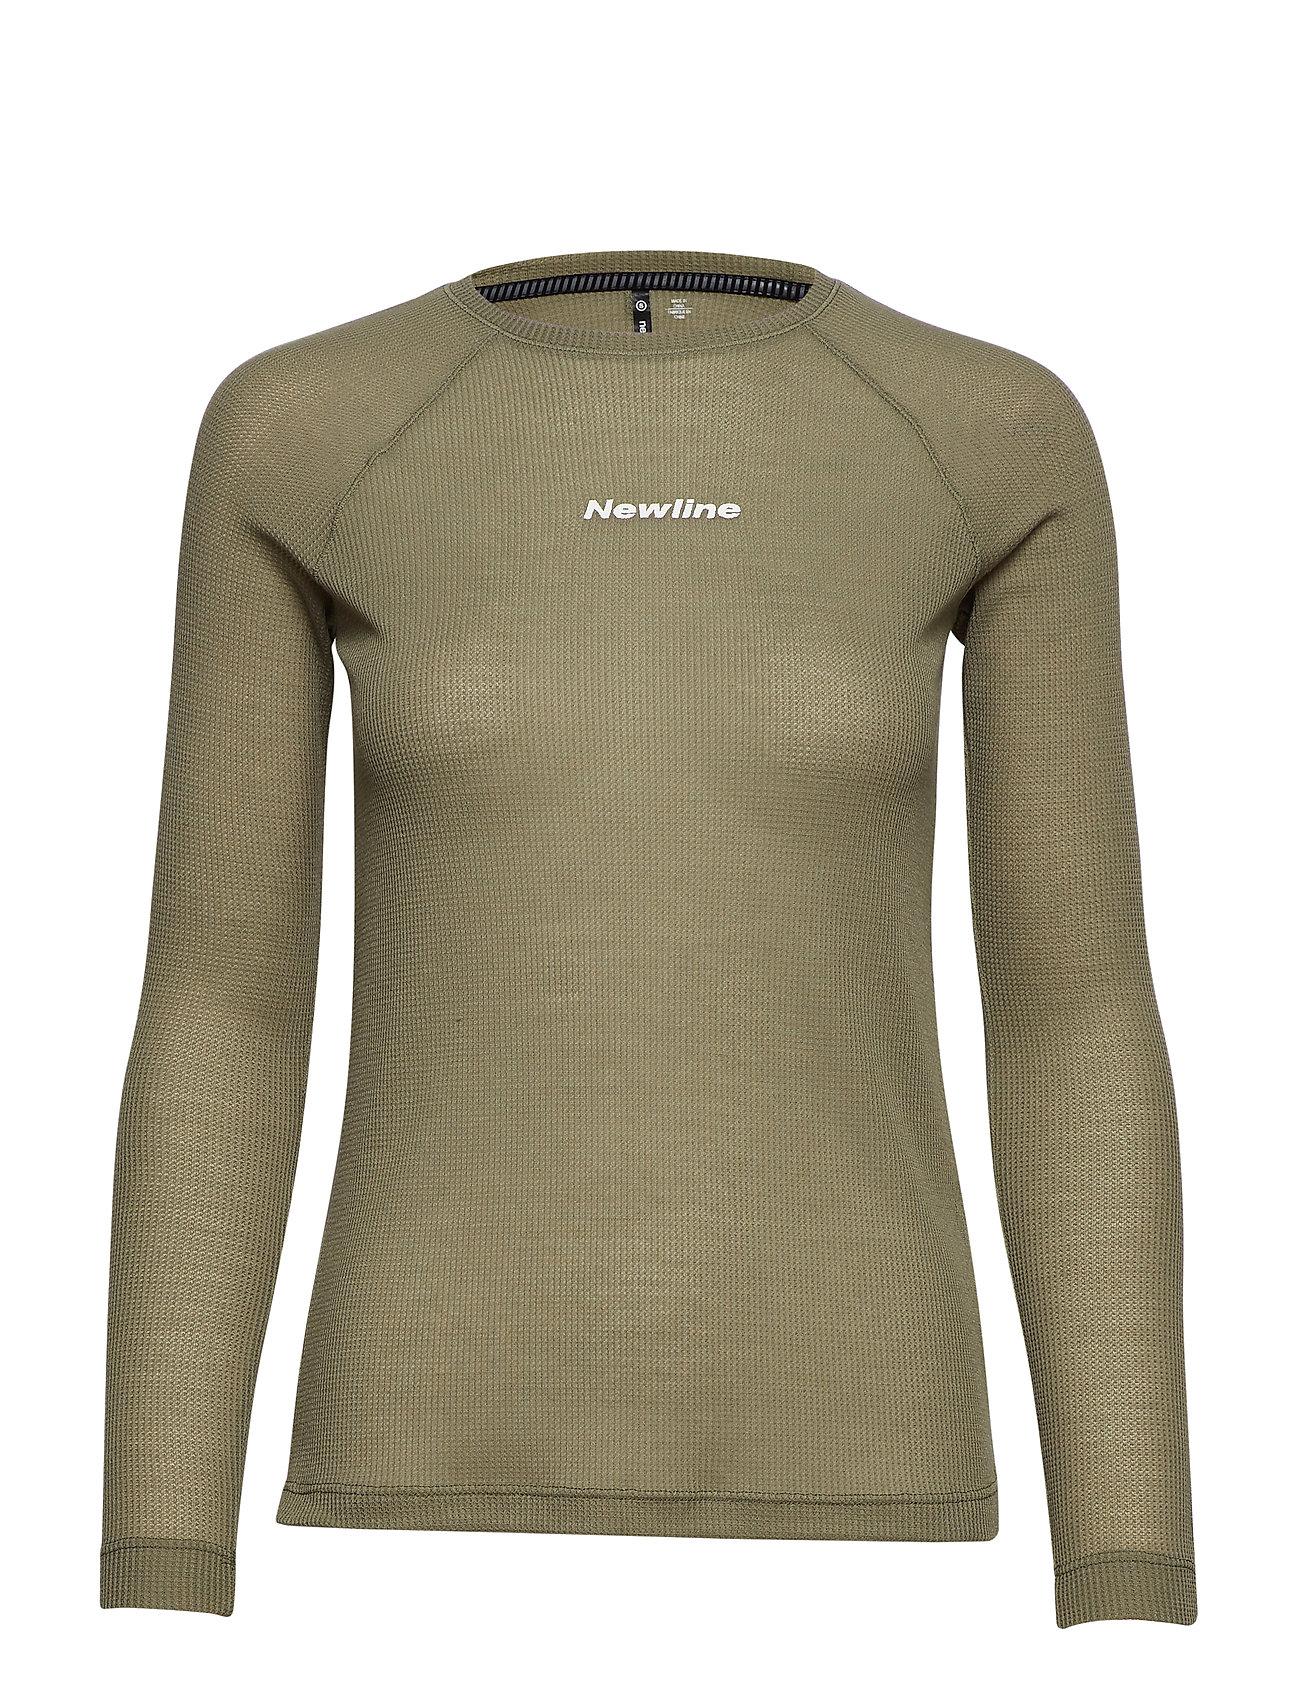 Newline Black shirt